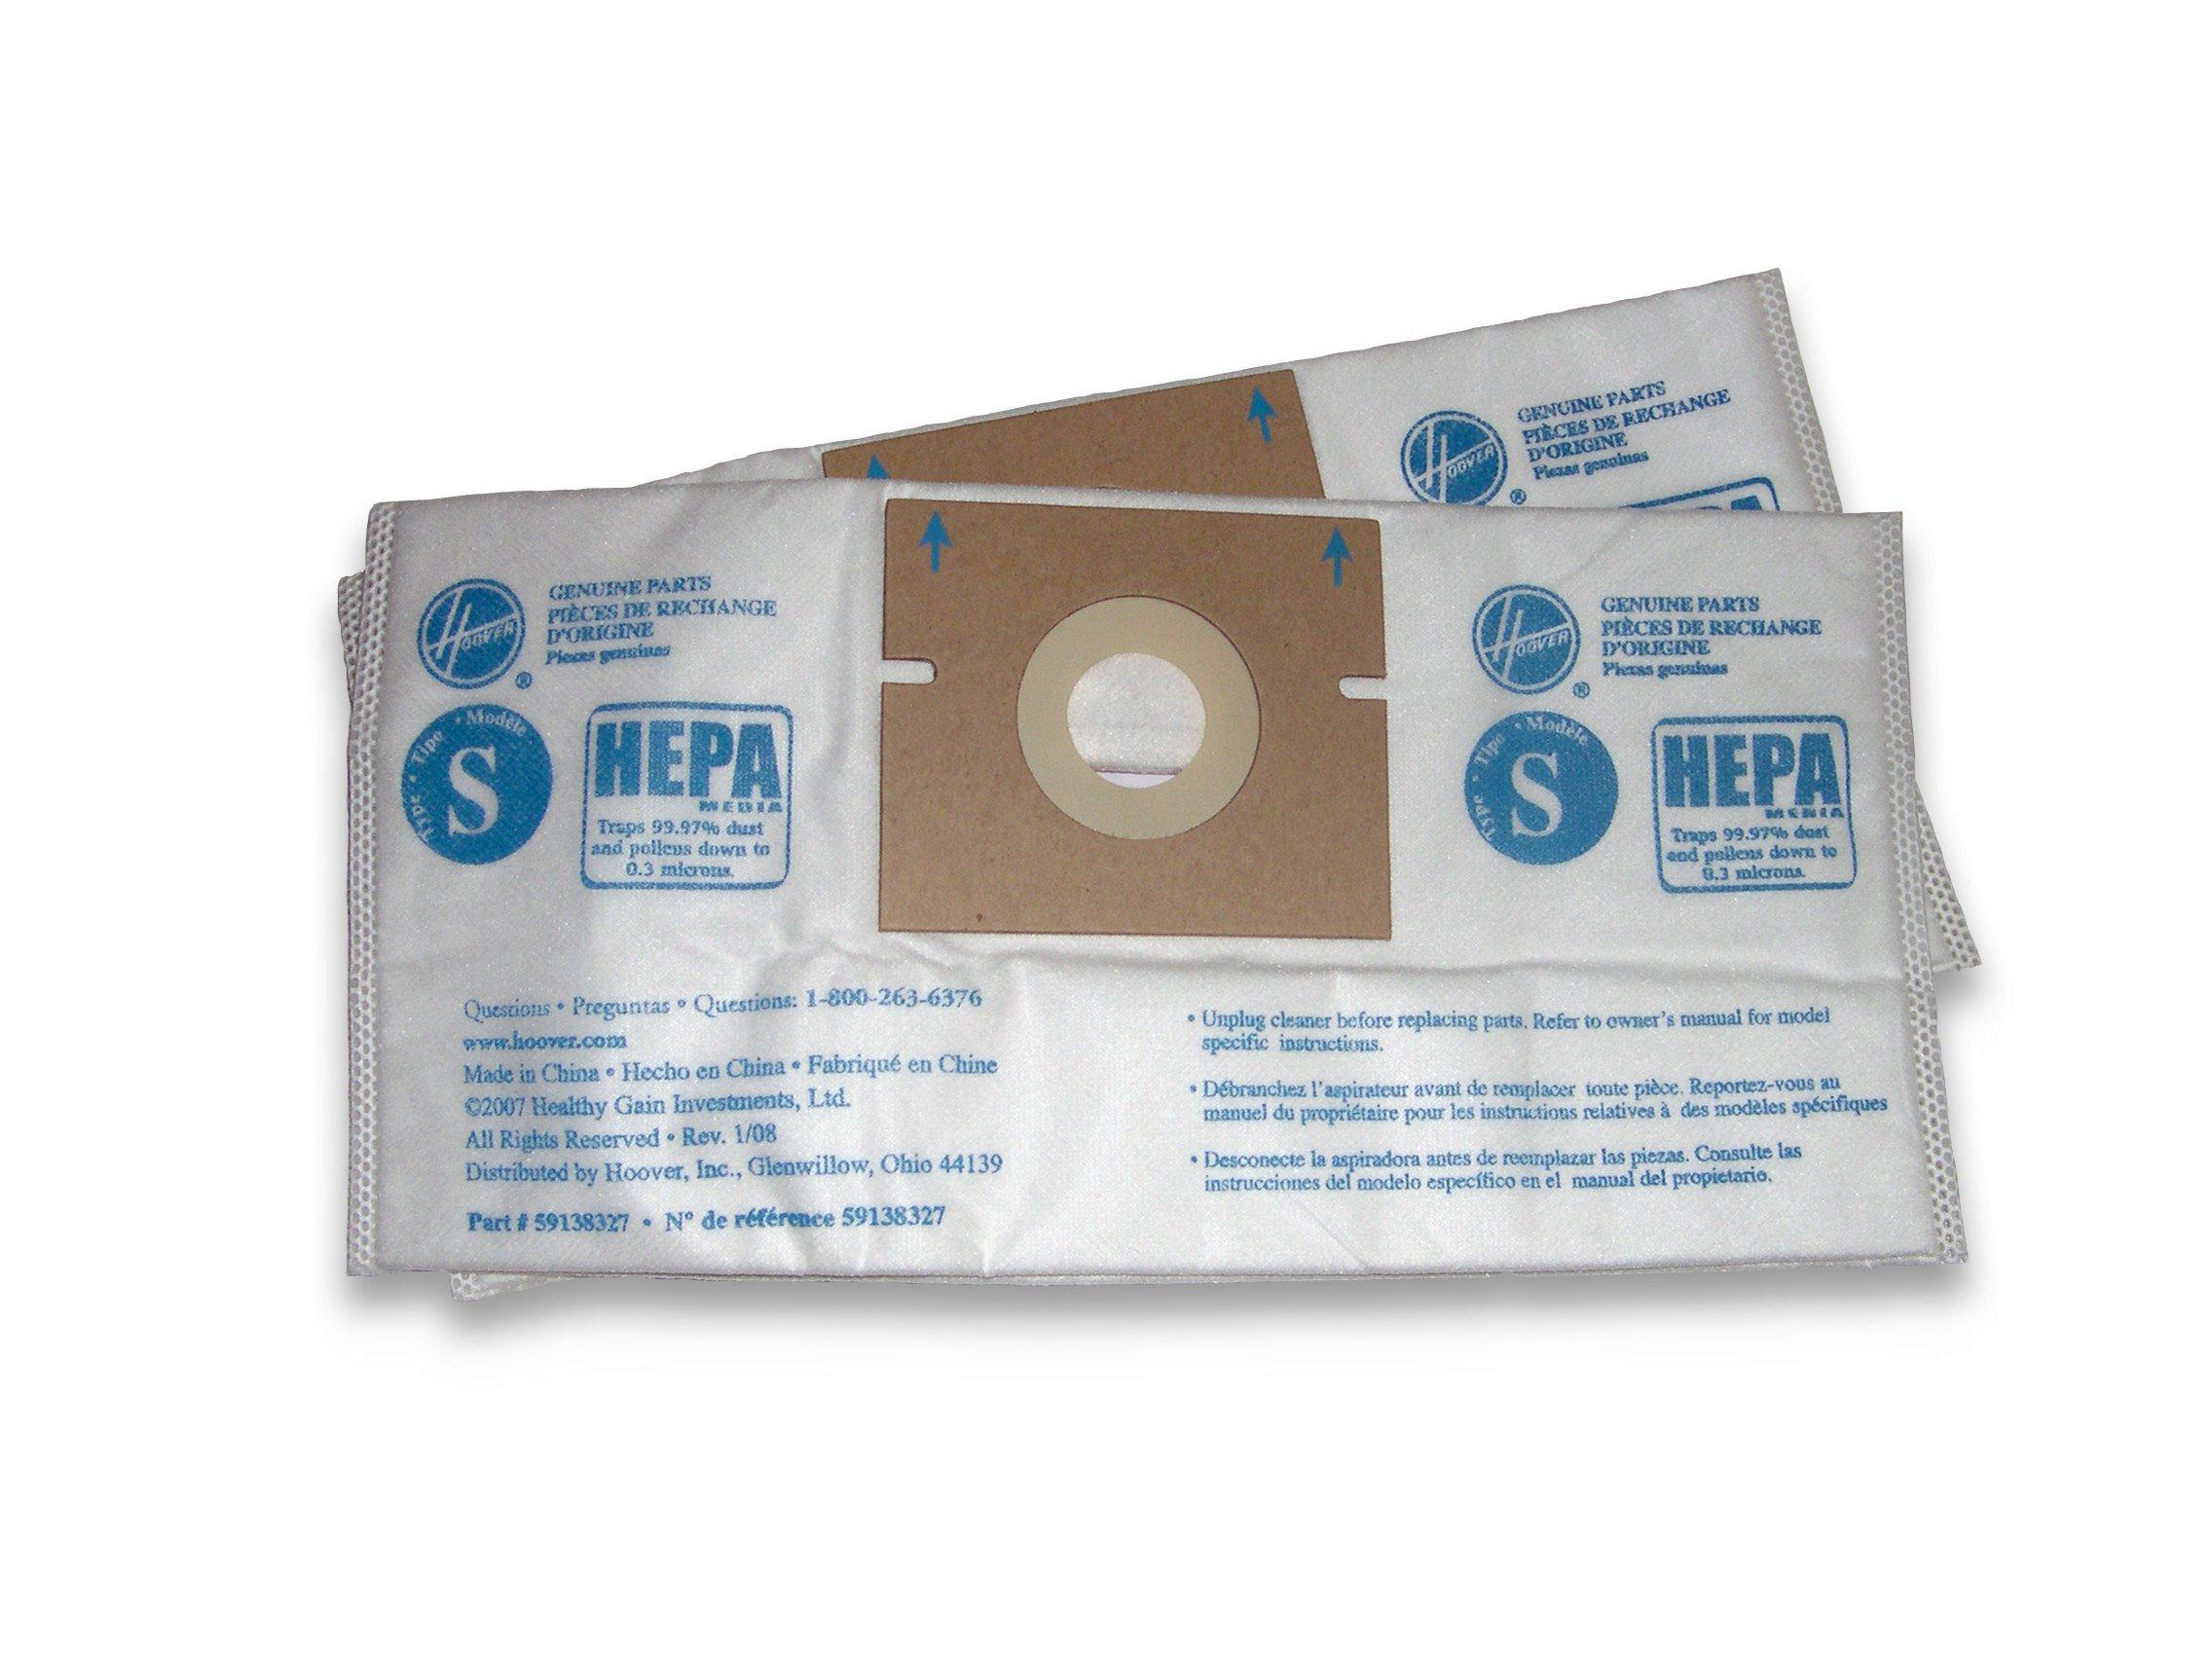 Type S HEPA Bag - 2 Pack3